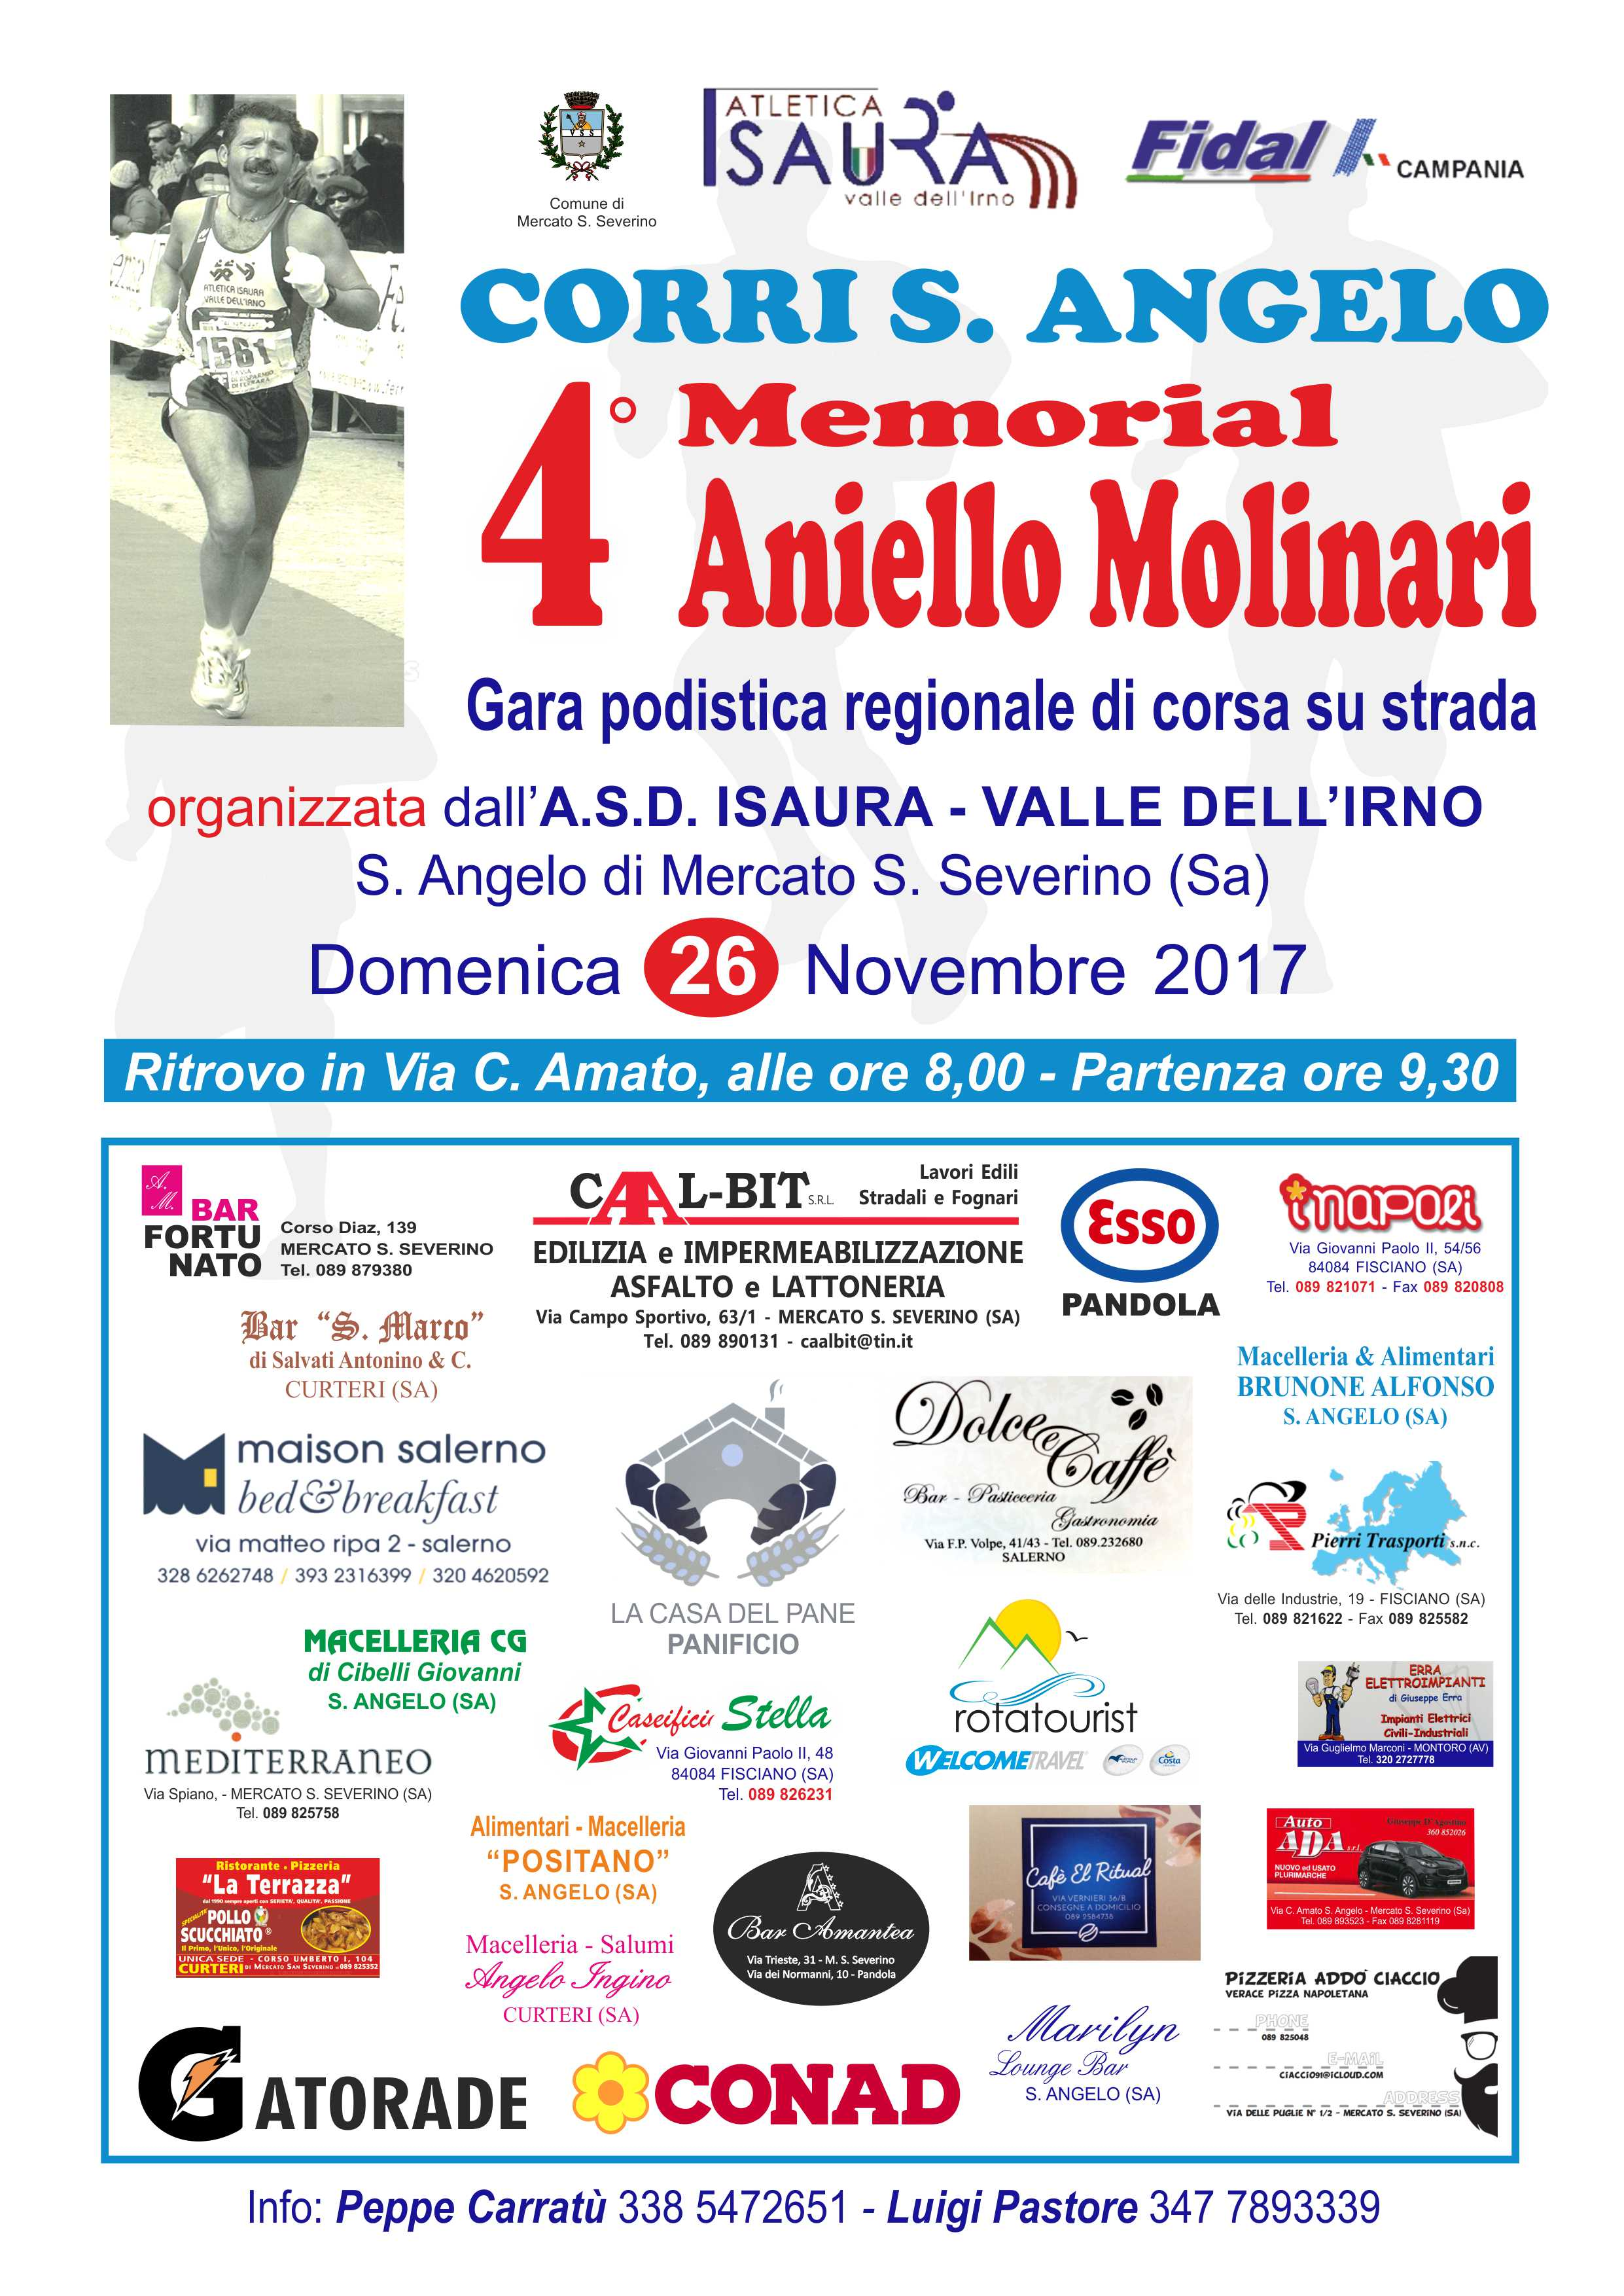 Memorial Molinari - Corri S.Angelo